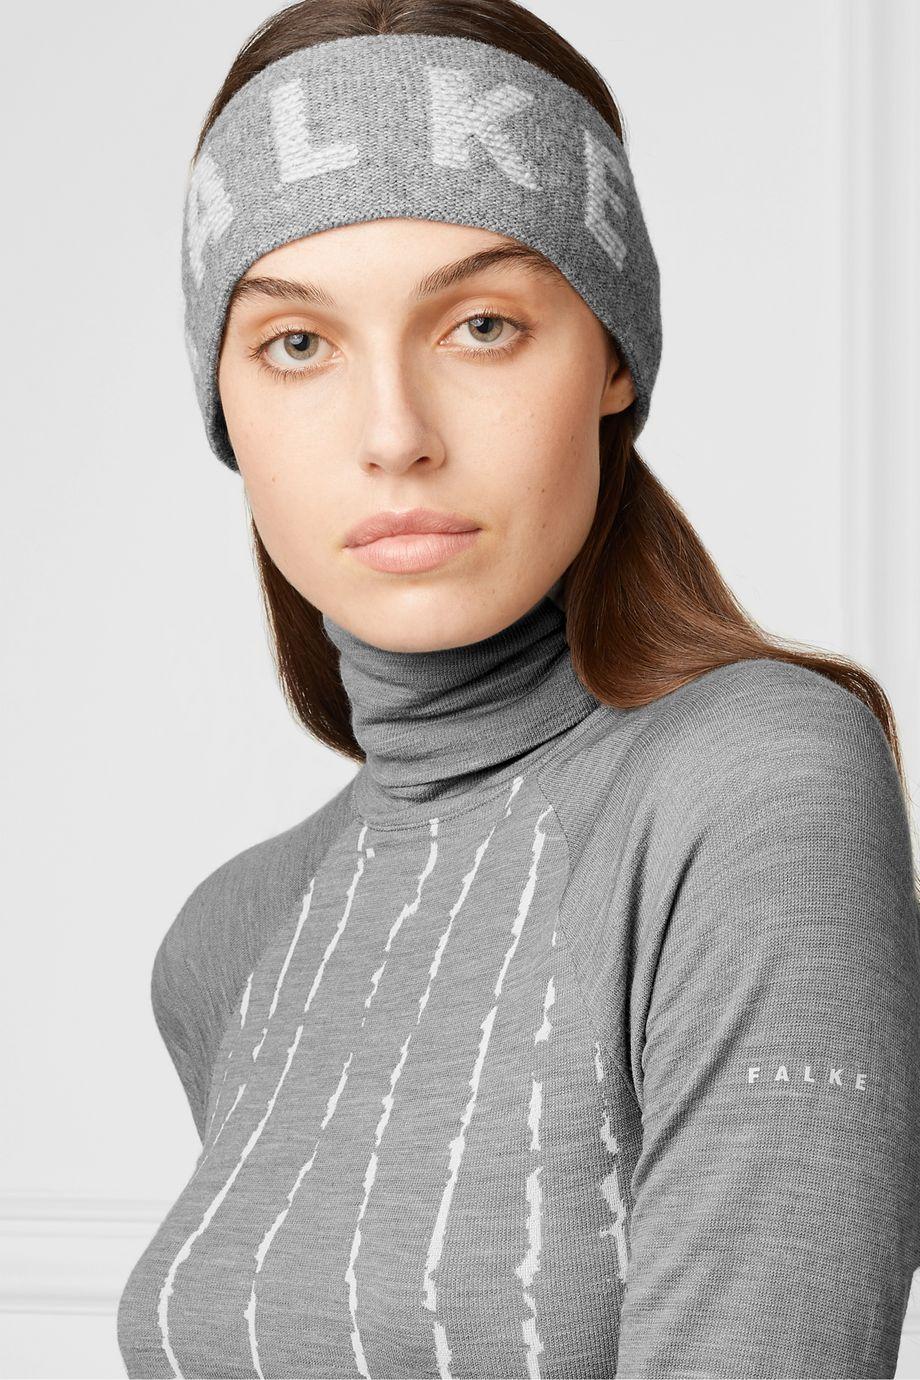 FALKE Ergonomic Sport System Wool-blend jacquard headband